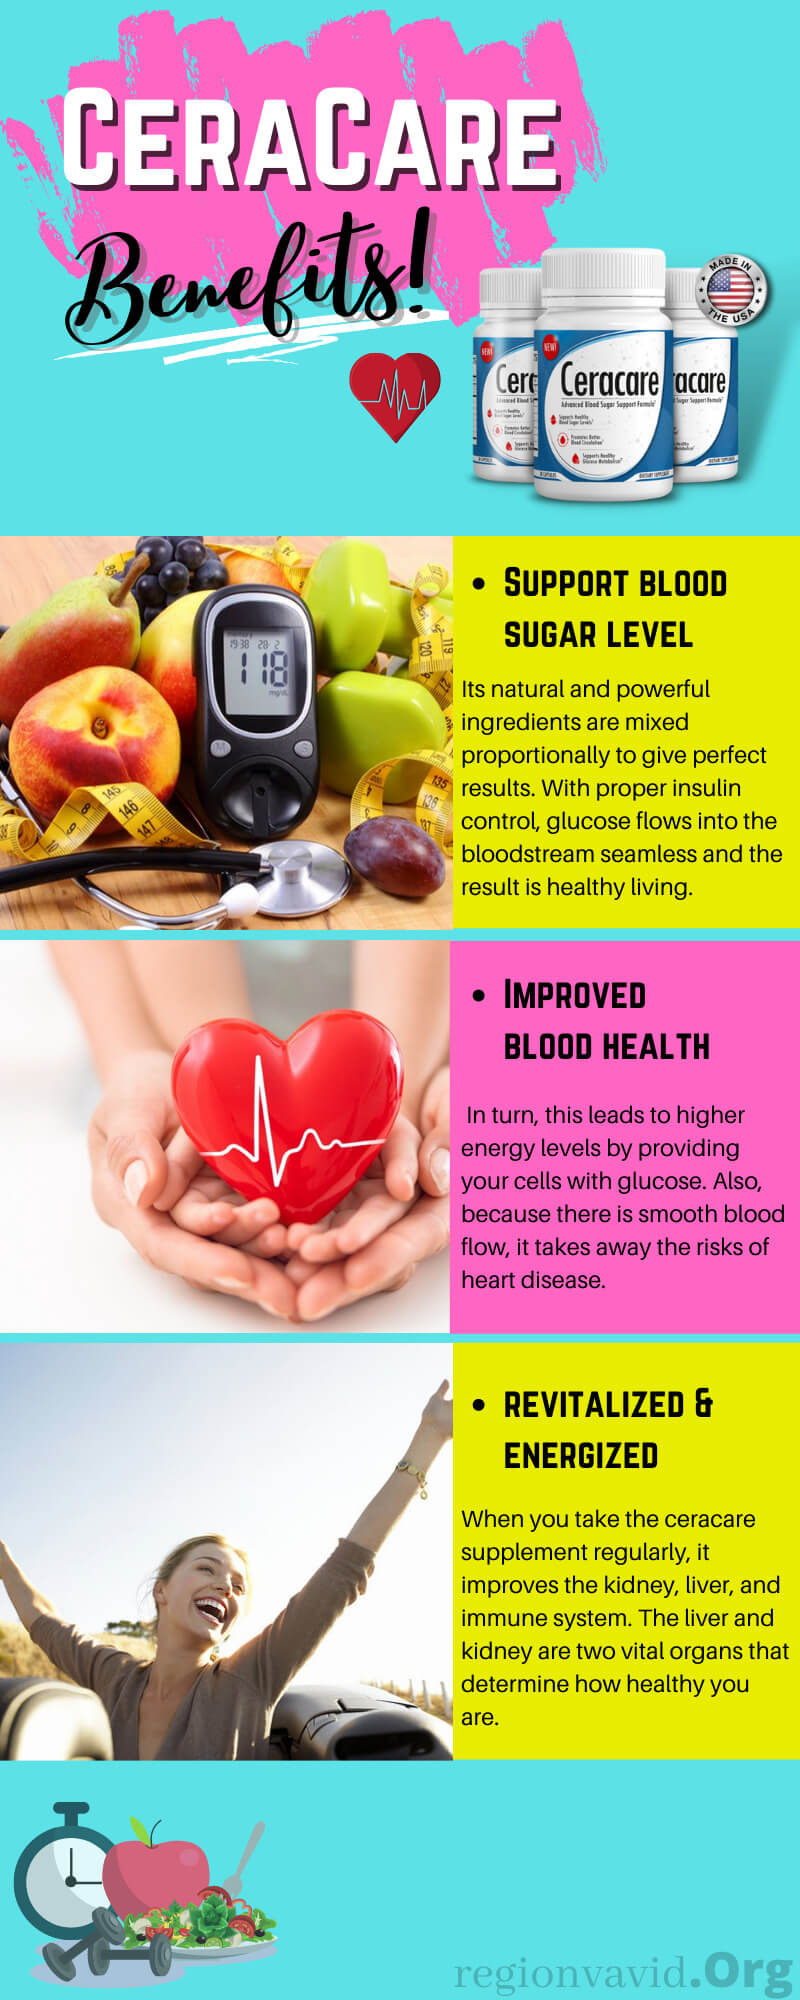 Ceracare Suplements Benefits